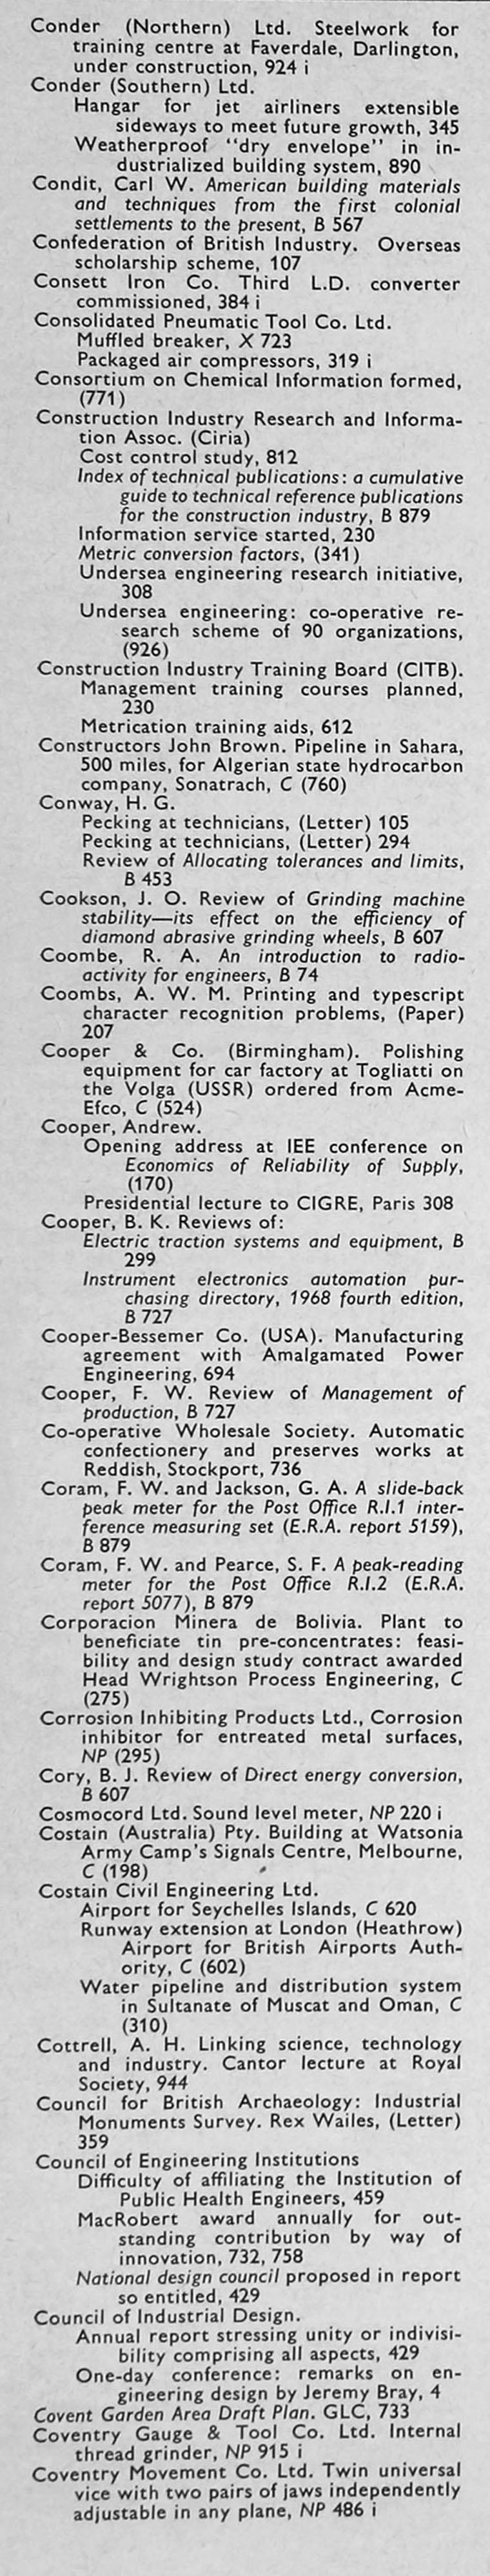 The Engineer 1968 Jul Dec Index 15 2009 808 Pm 1963 Circuitbreakeridentificationatjpg